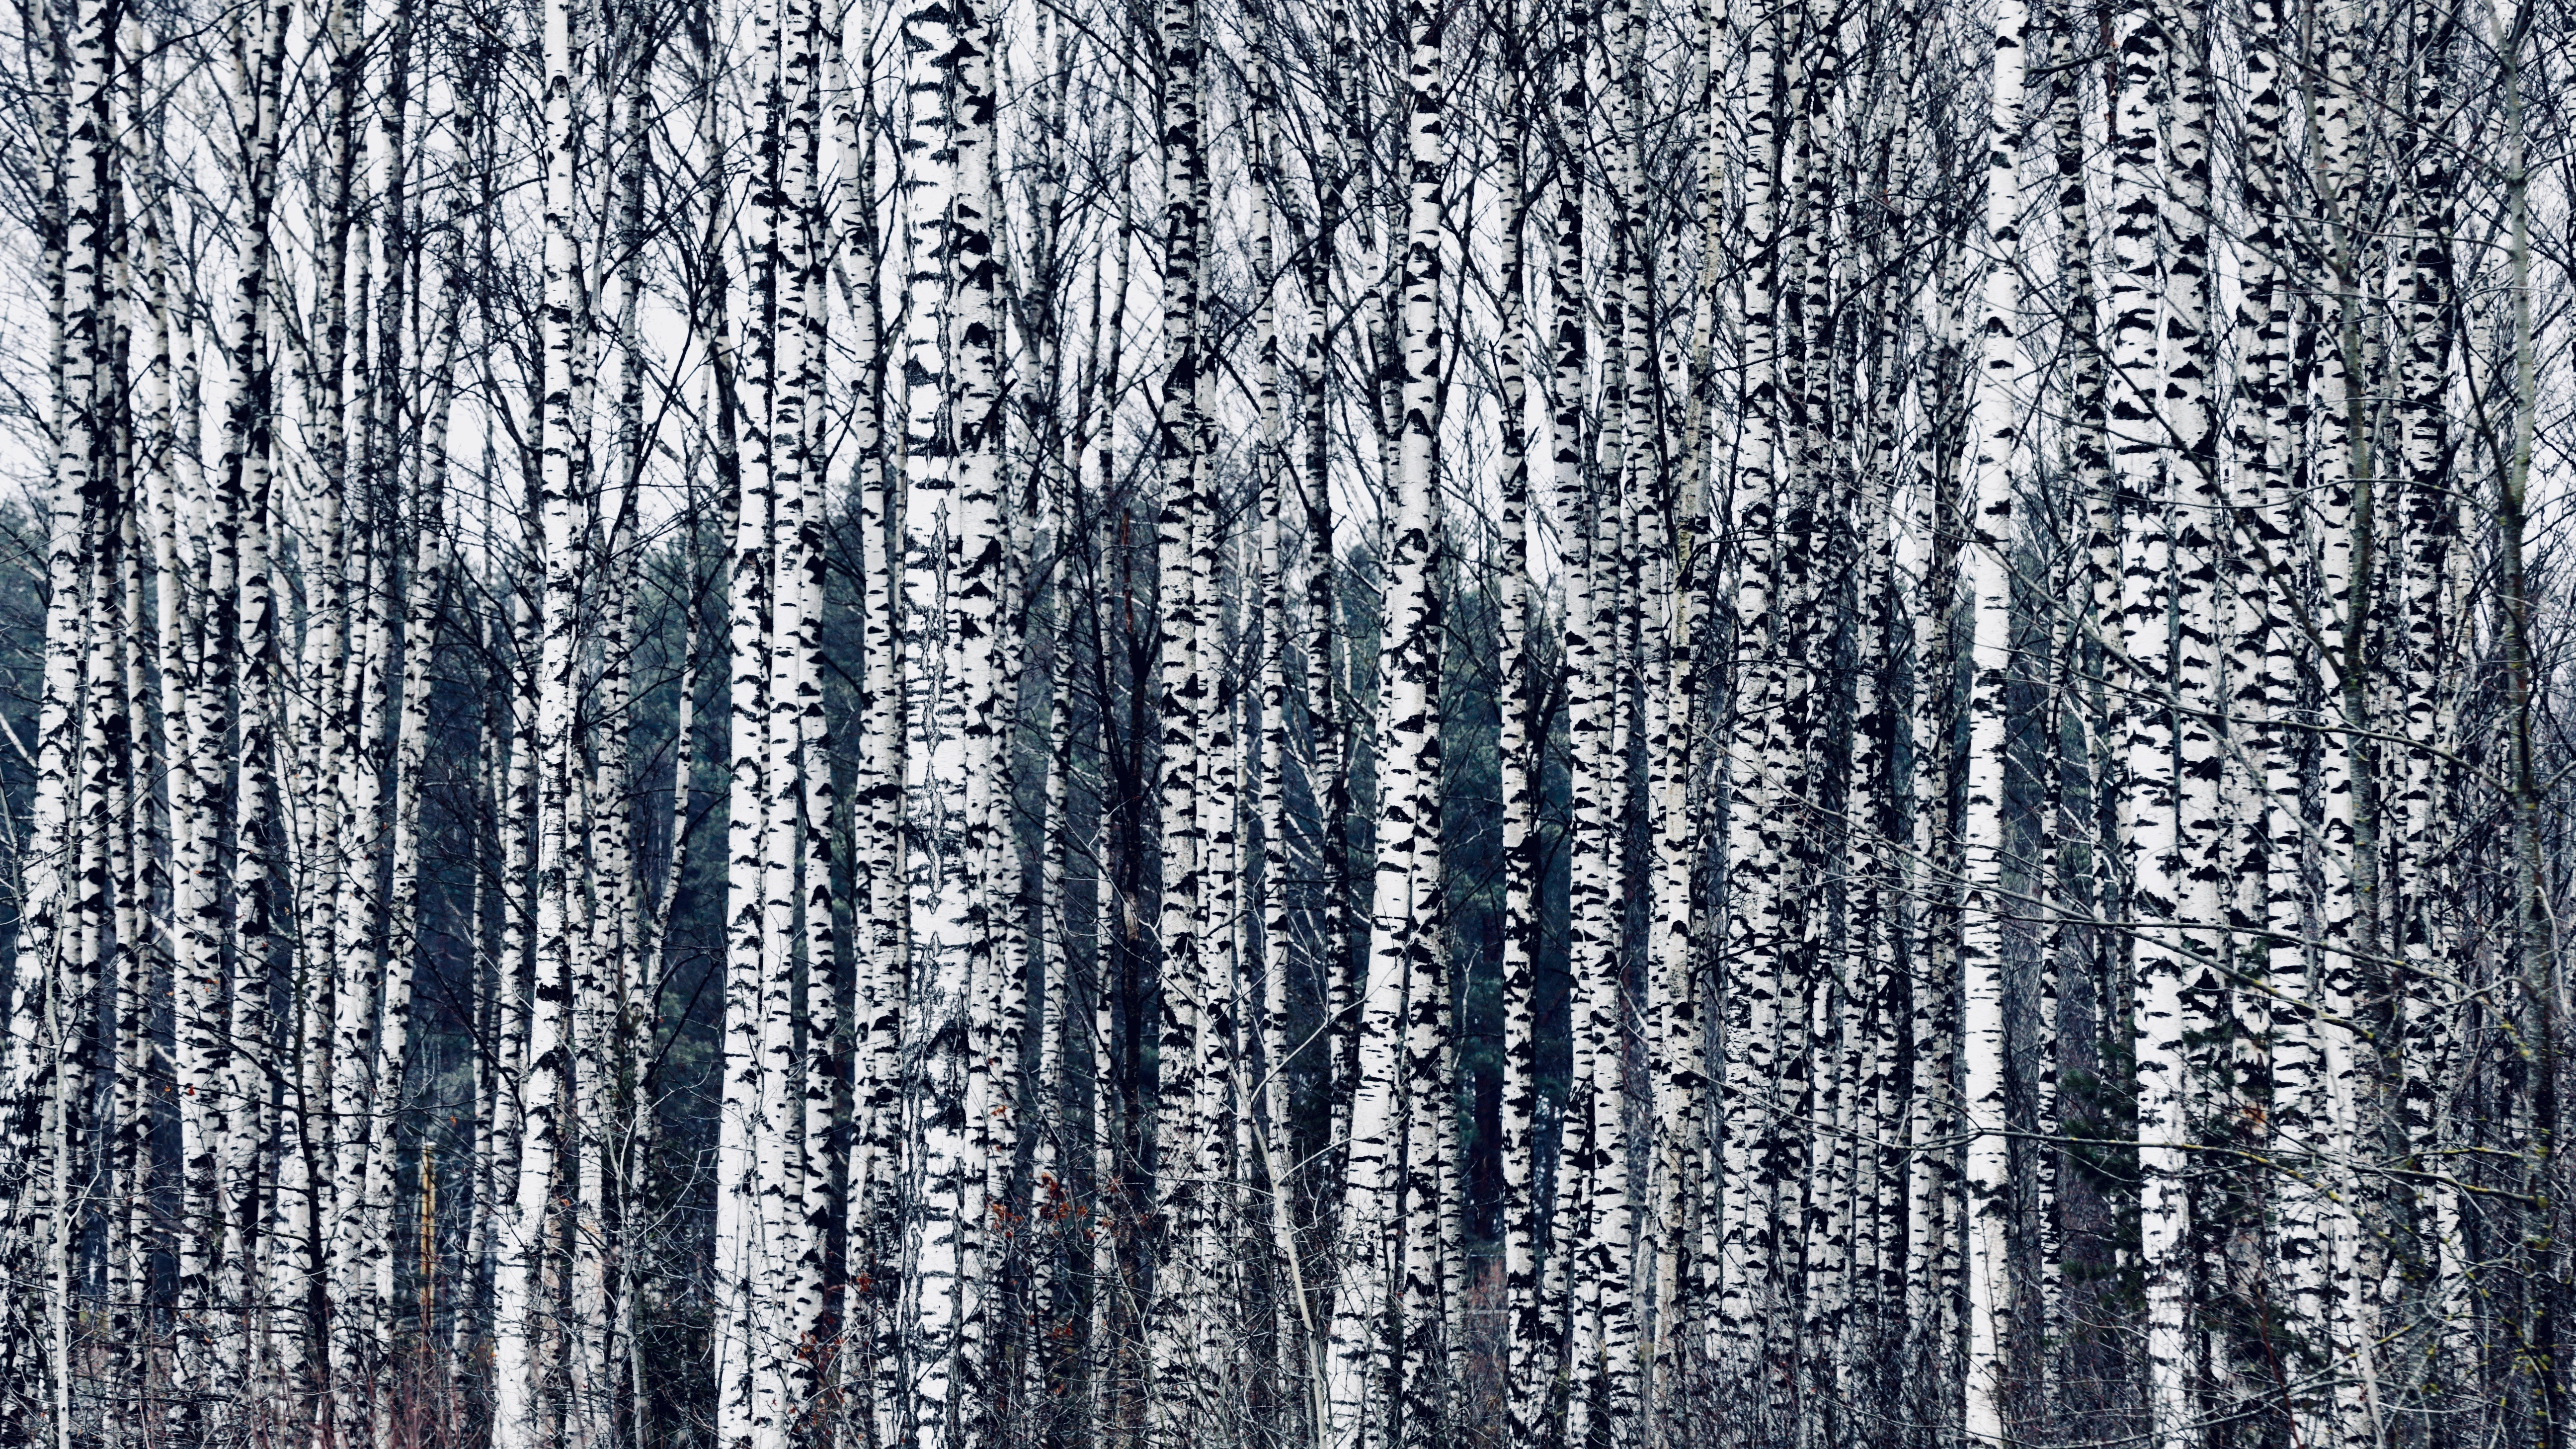 Birch trees in Latvia.